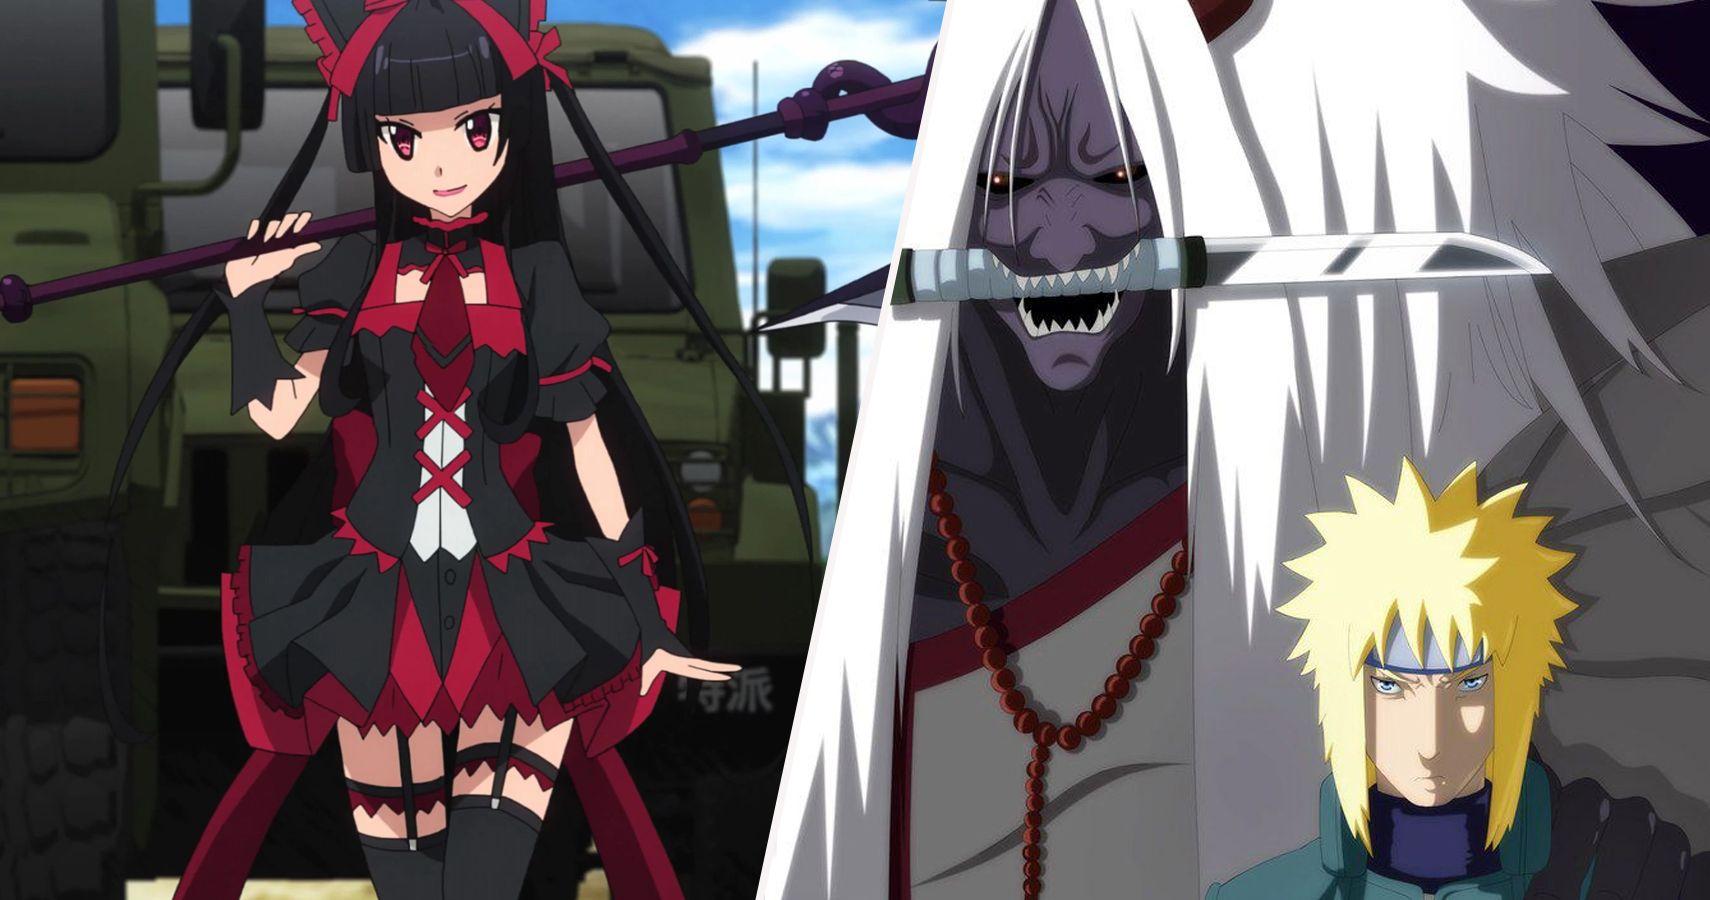 The grim reaper anime